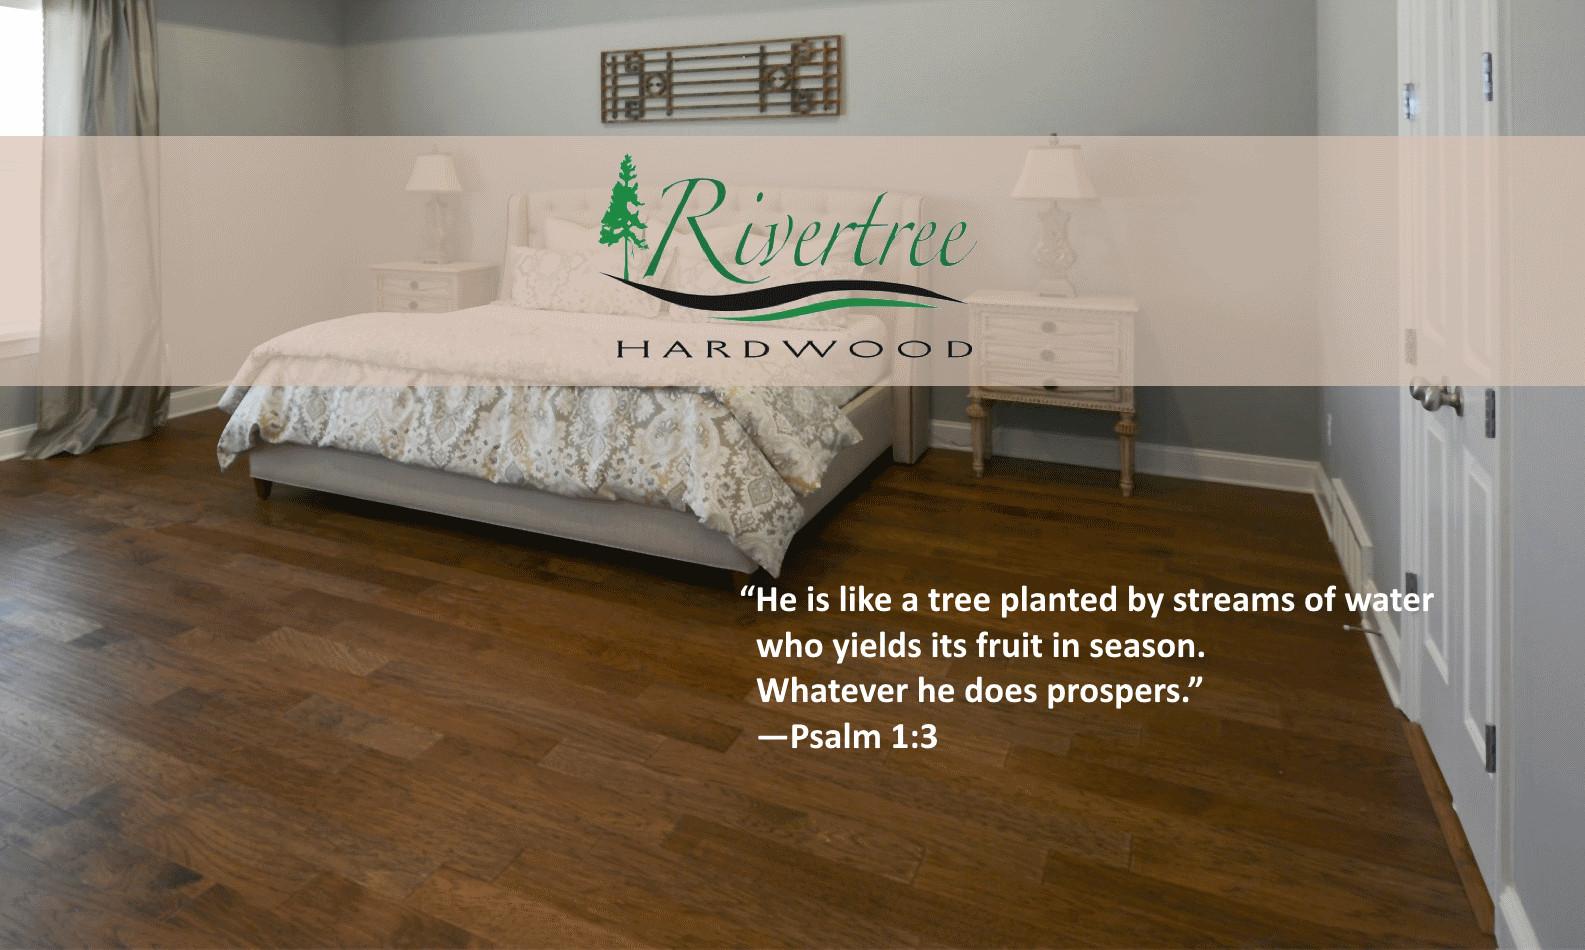 27 Lovely Hardwood Floor Protectors for Bed Frames 2021 free download hardwood floor protectors for bed frames of rivertree hardwood inc within sliderpix2